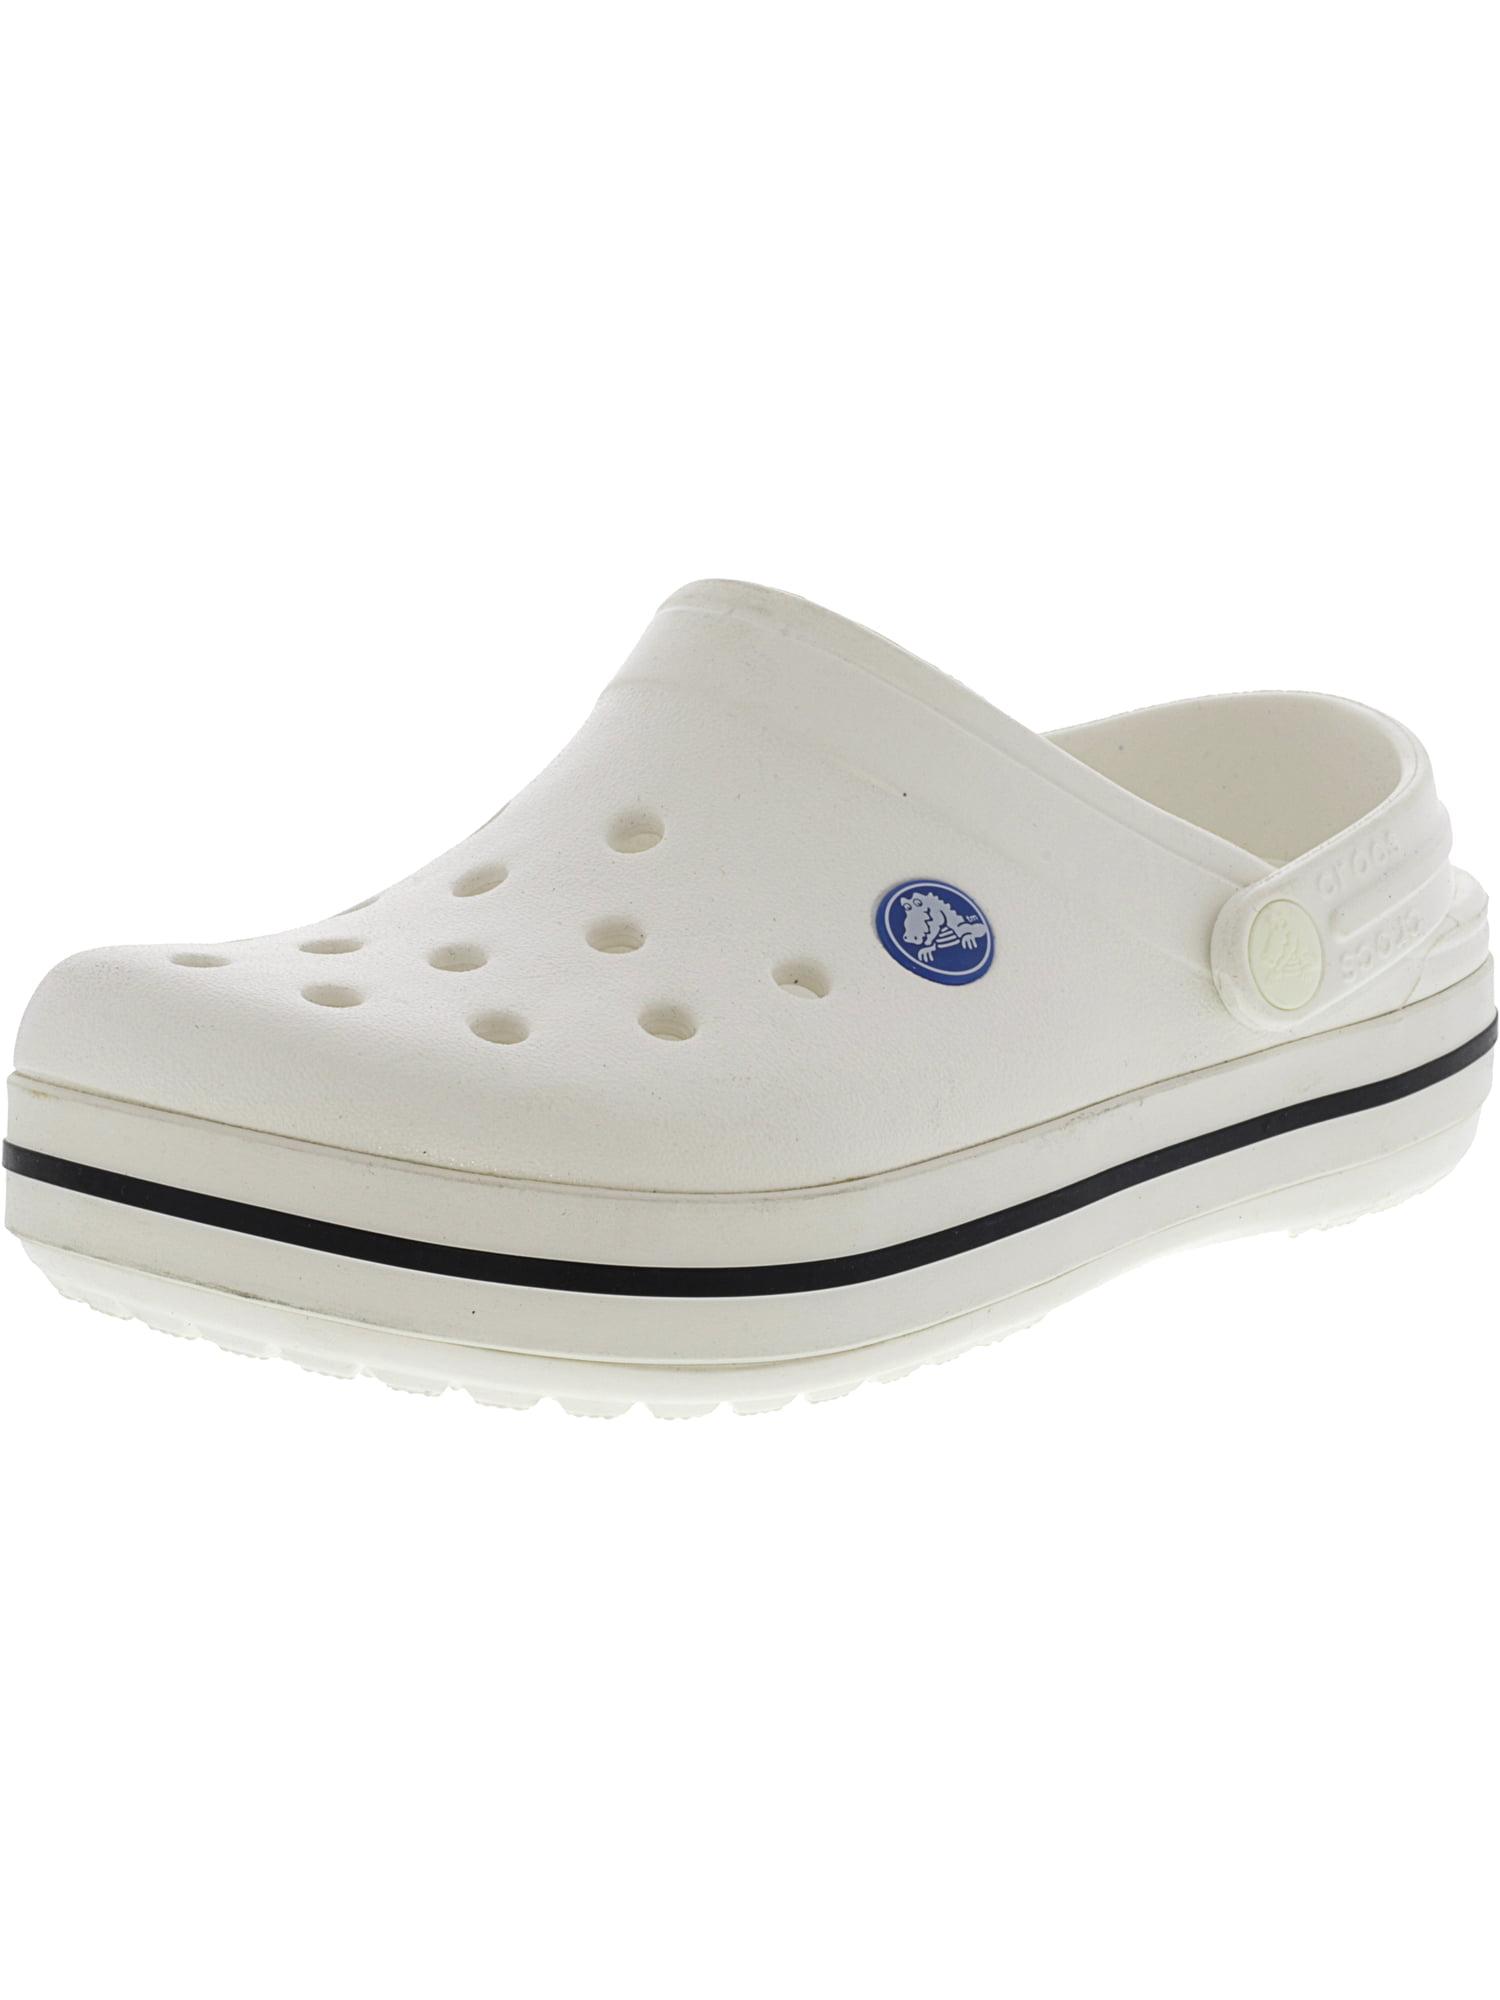 Crocs Kids Crocband Clog White Clogs - 2M